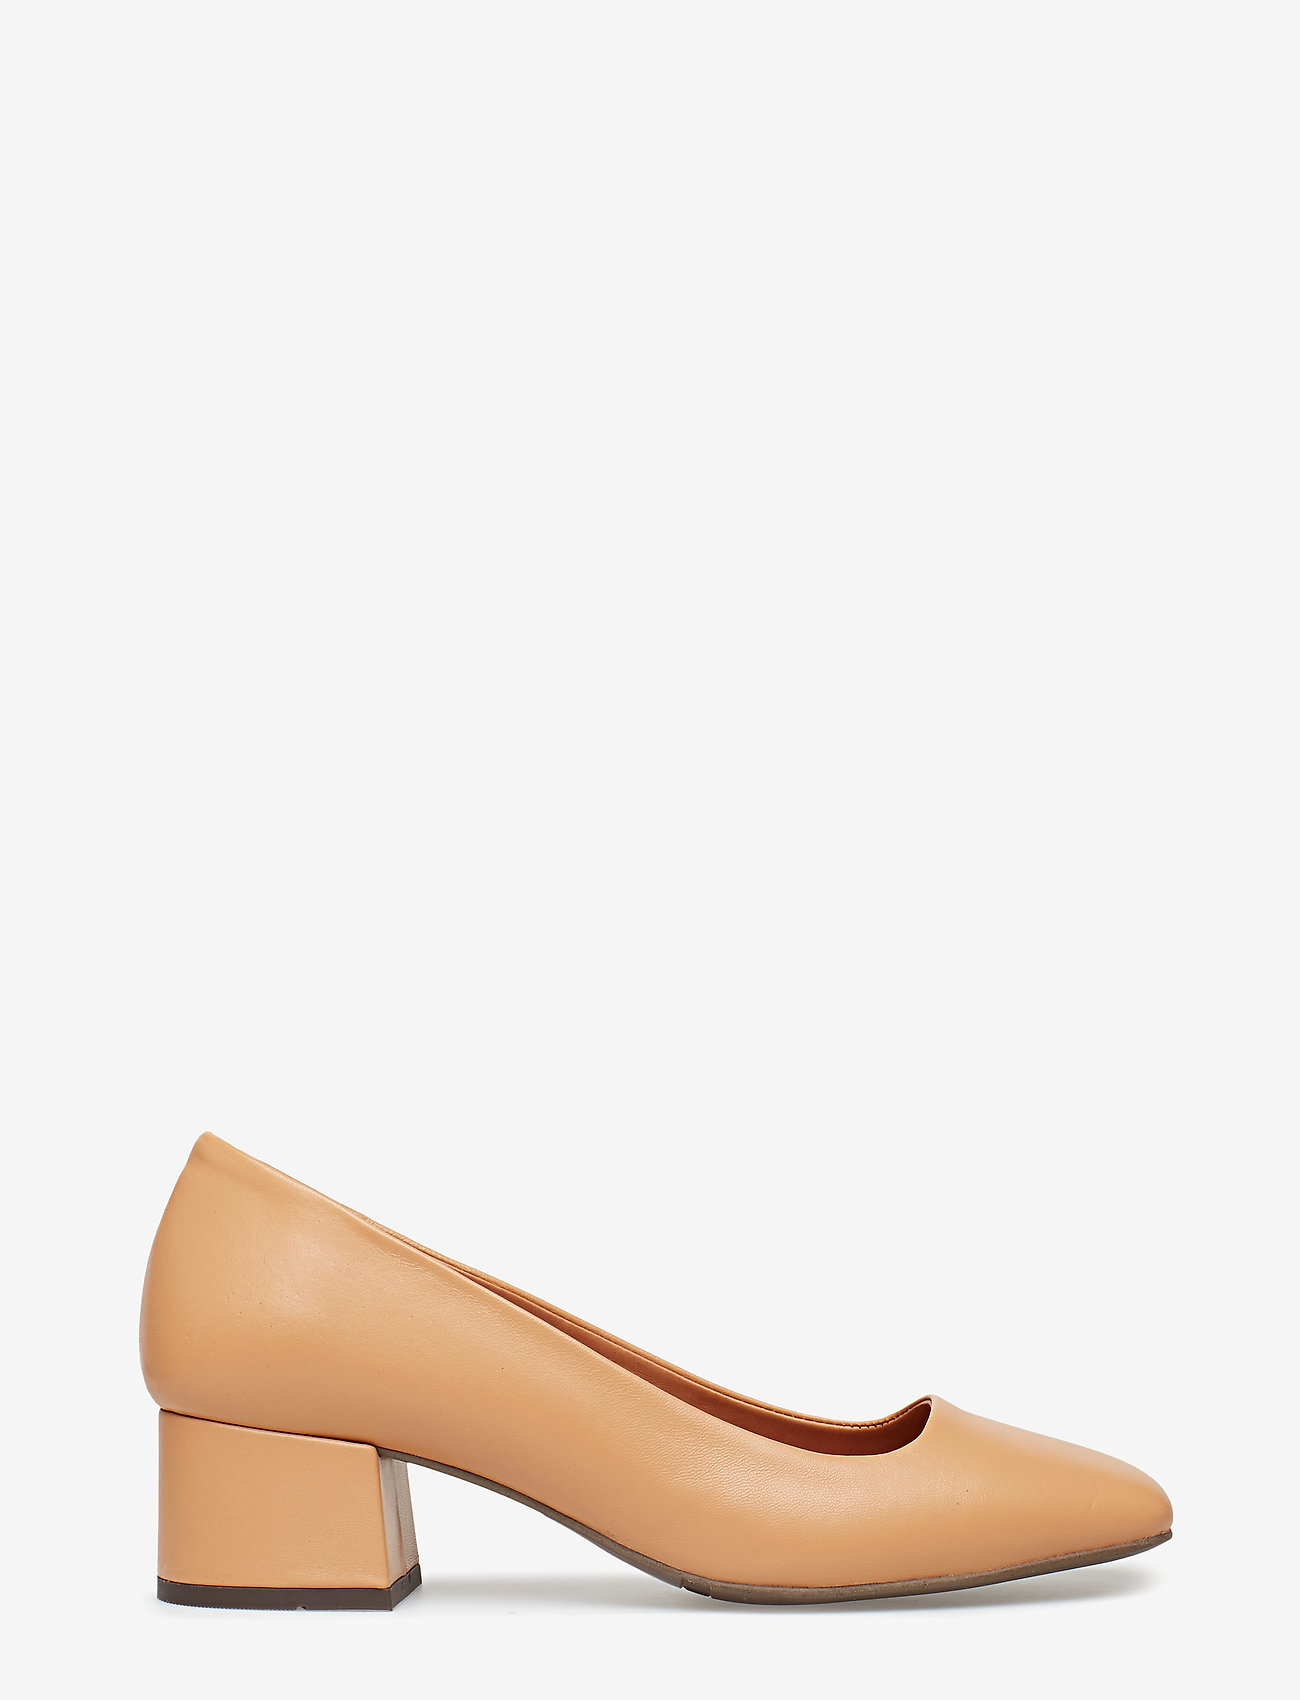 Billi Bi Pumps 8800 - Heeled Shoes